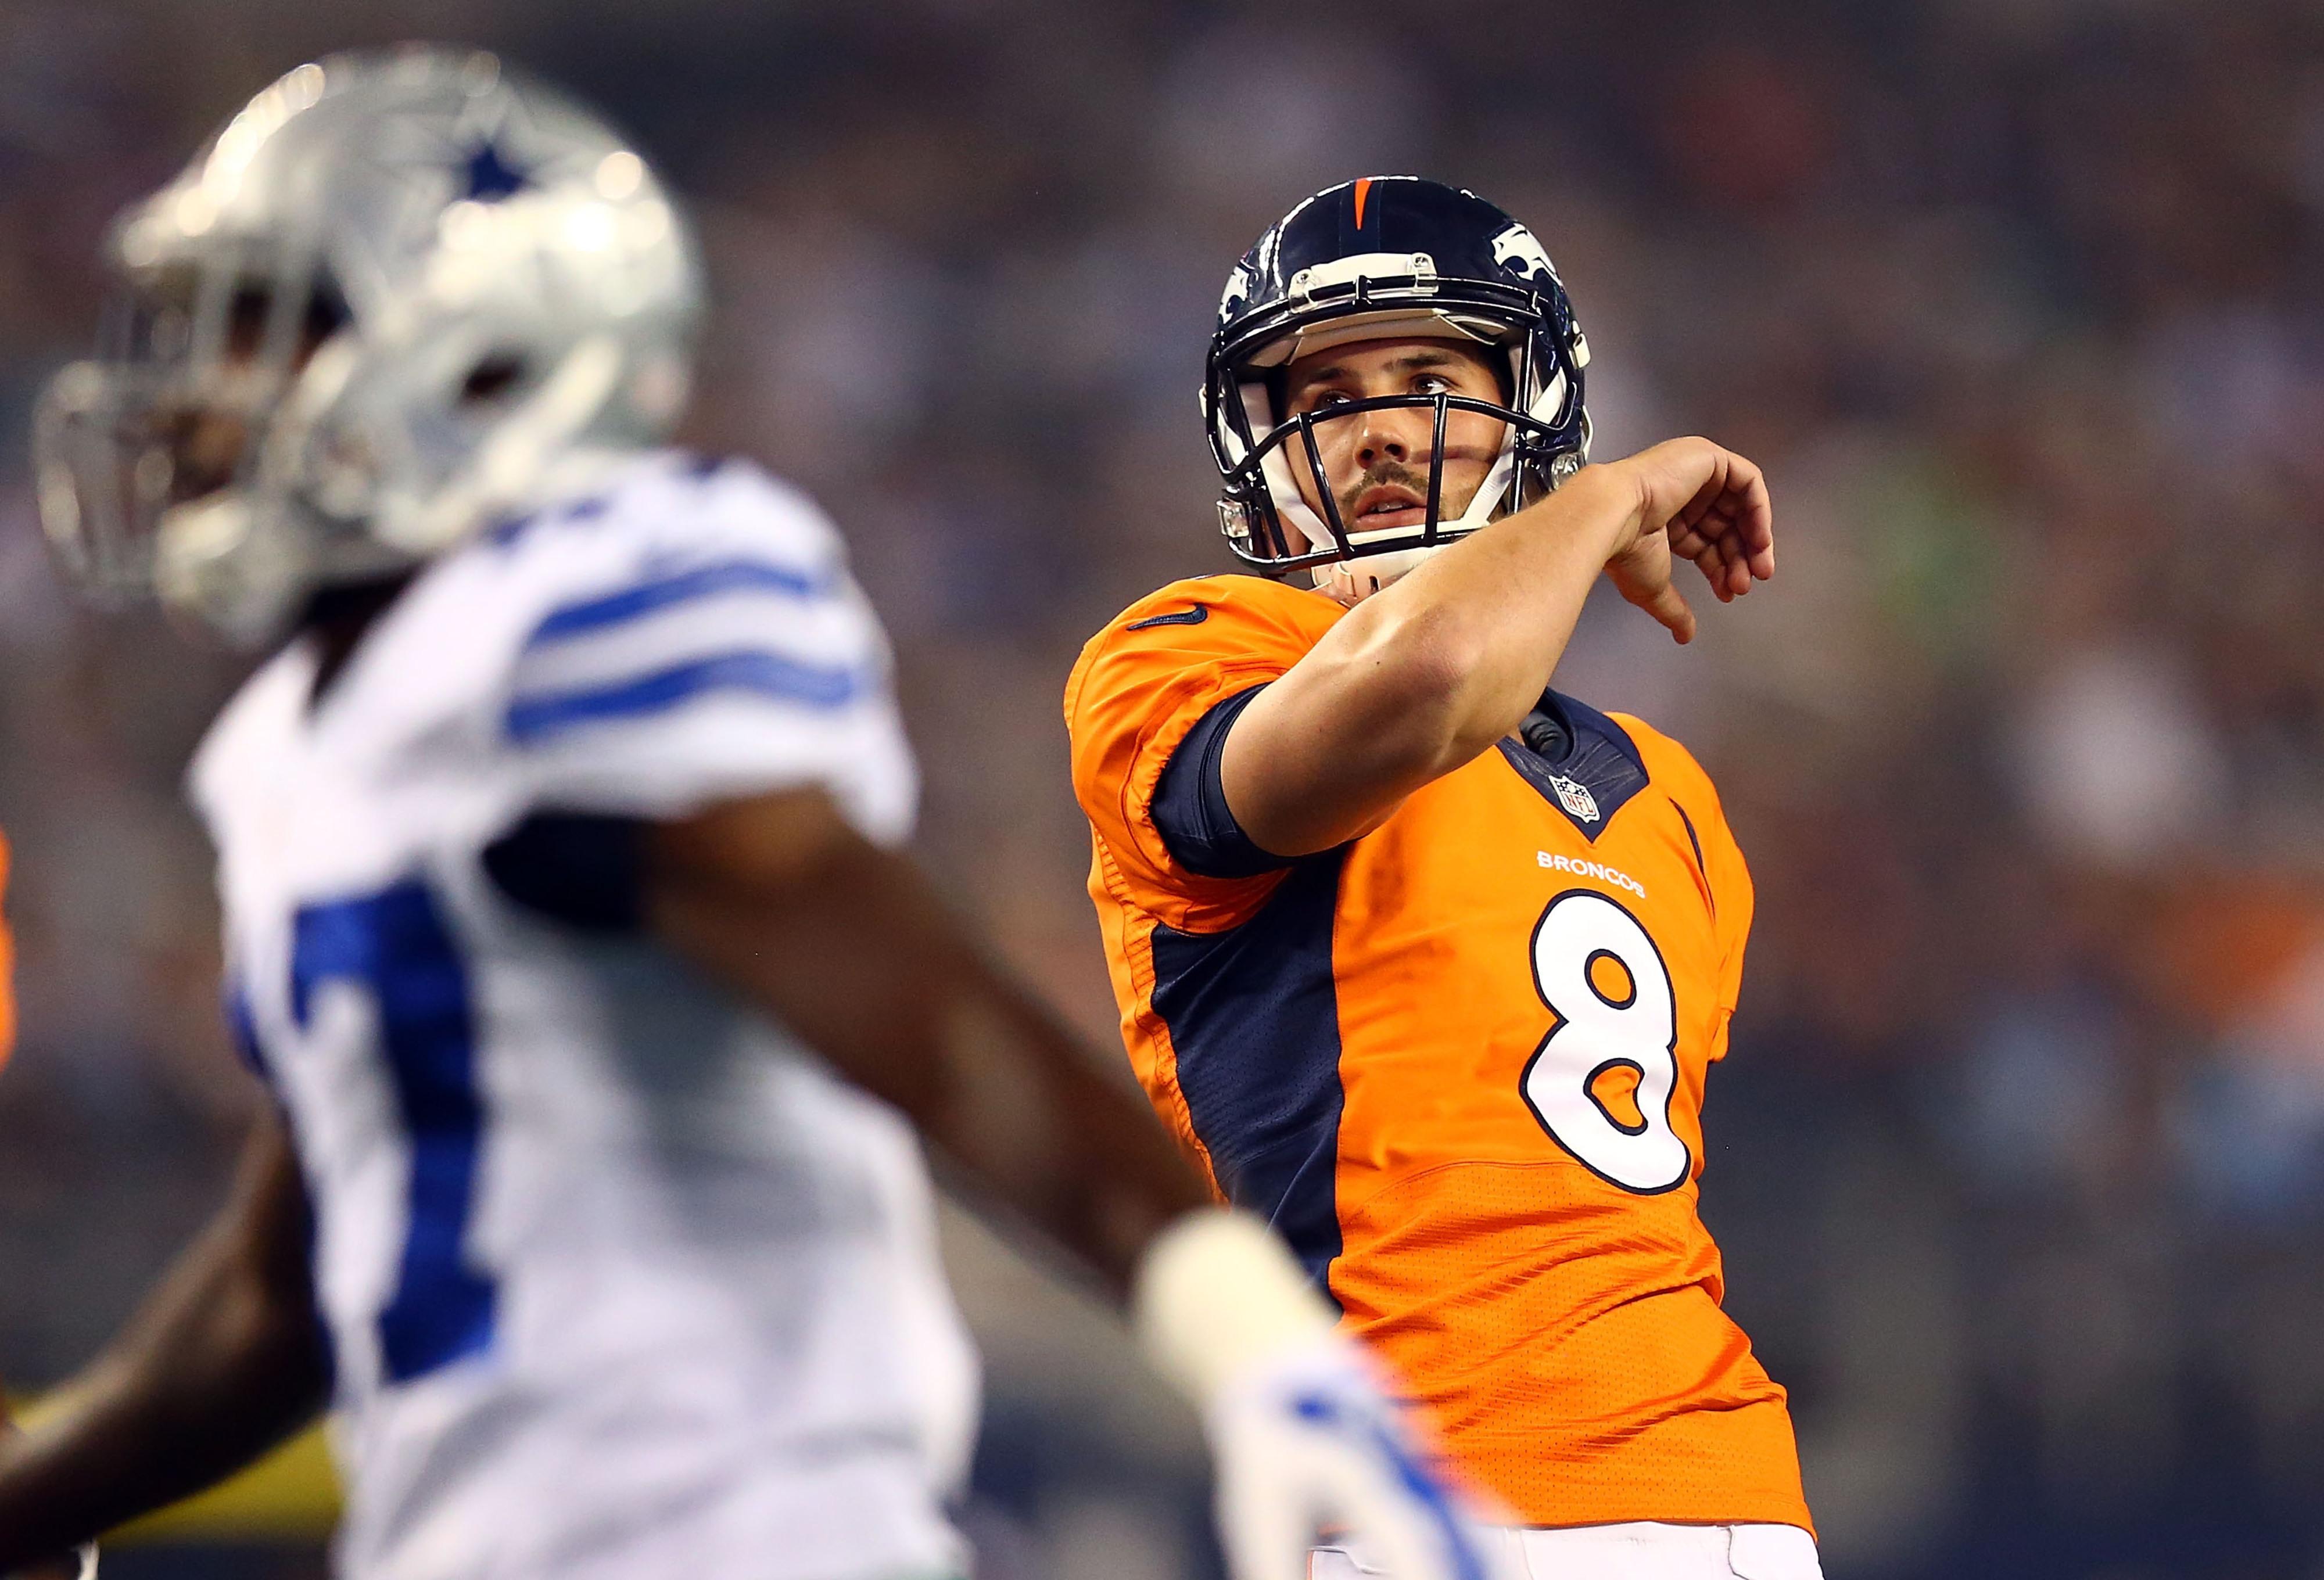 Brandon McManus struggles in Broncos debut; fantasy value iffy